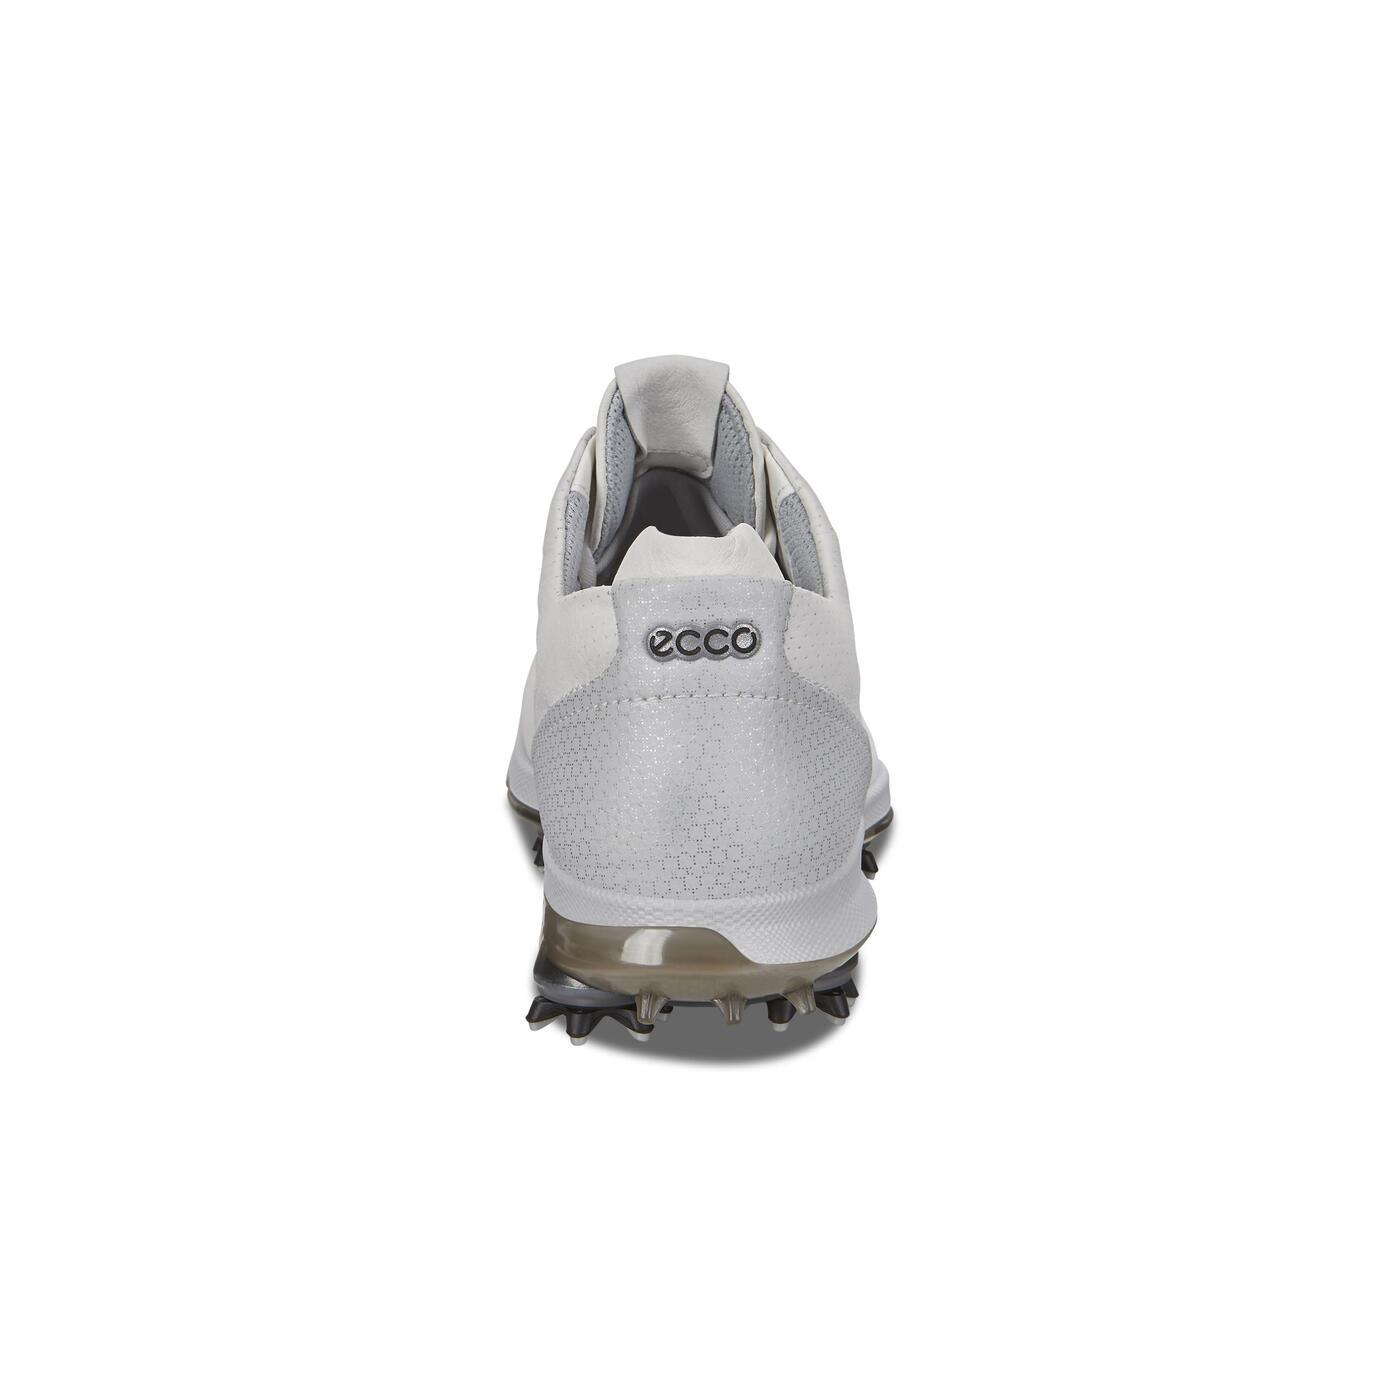 ECCO 여성 골프화 바이옴 G2 고어텍스 101563-54510